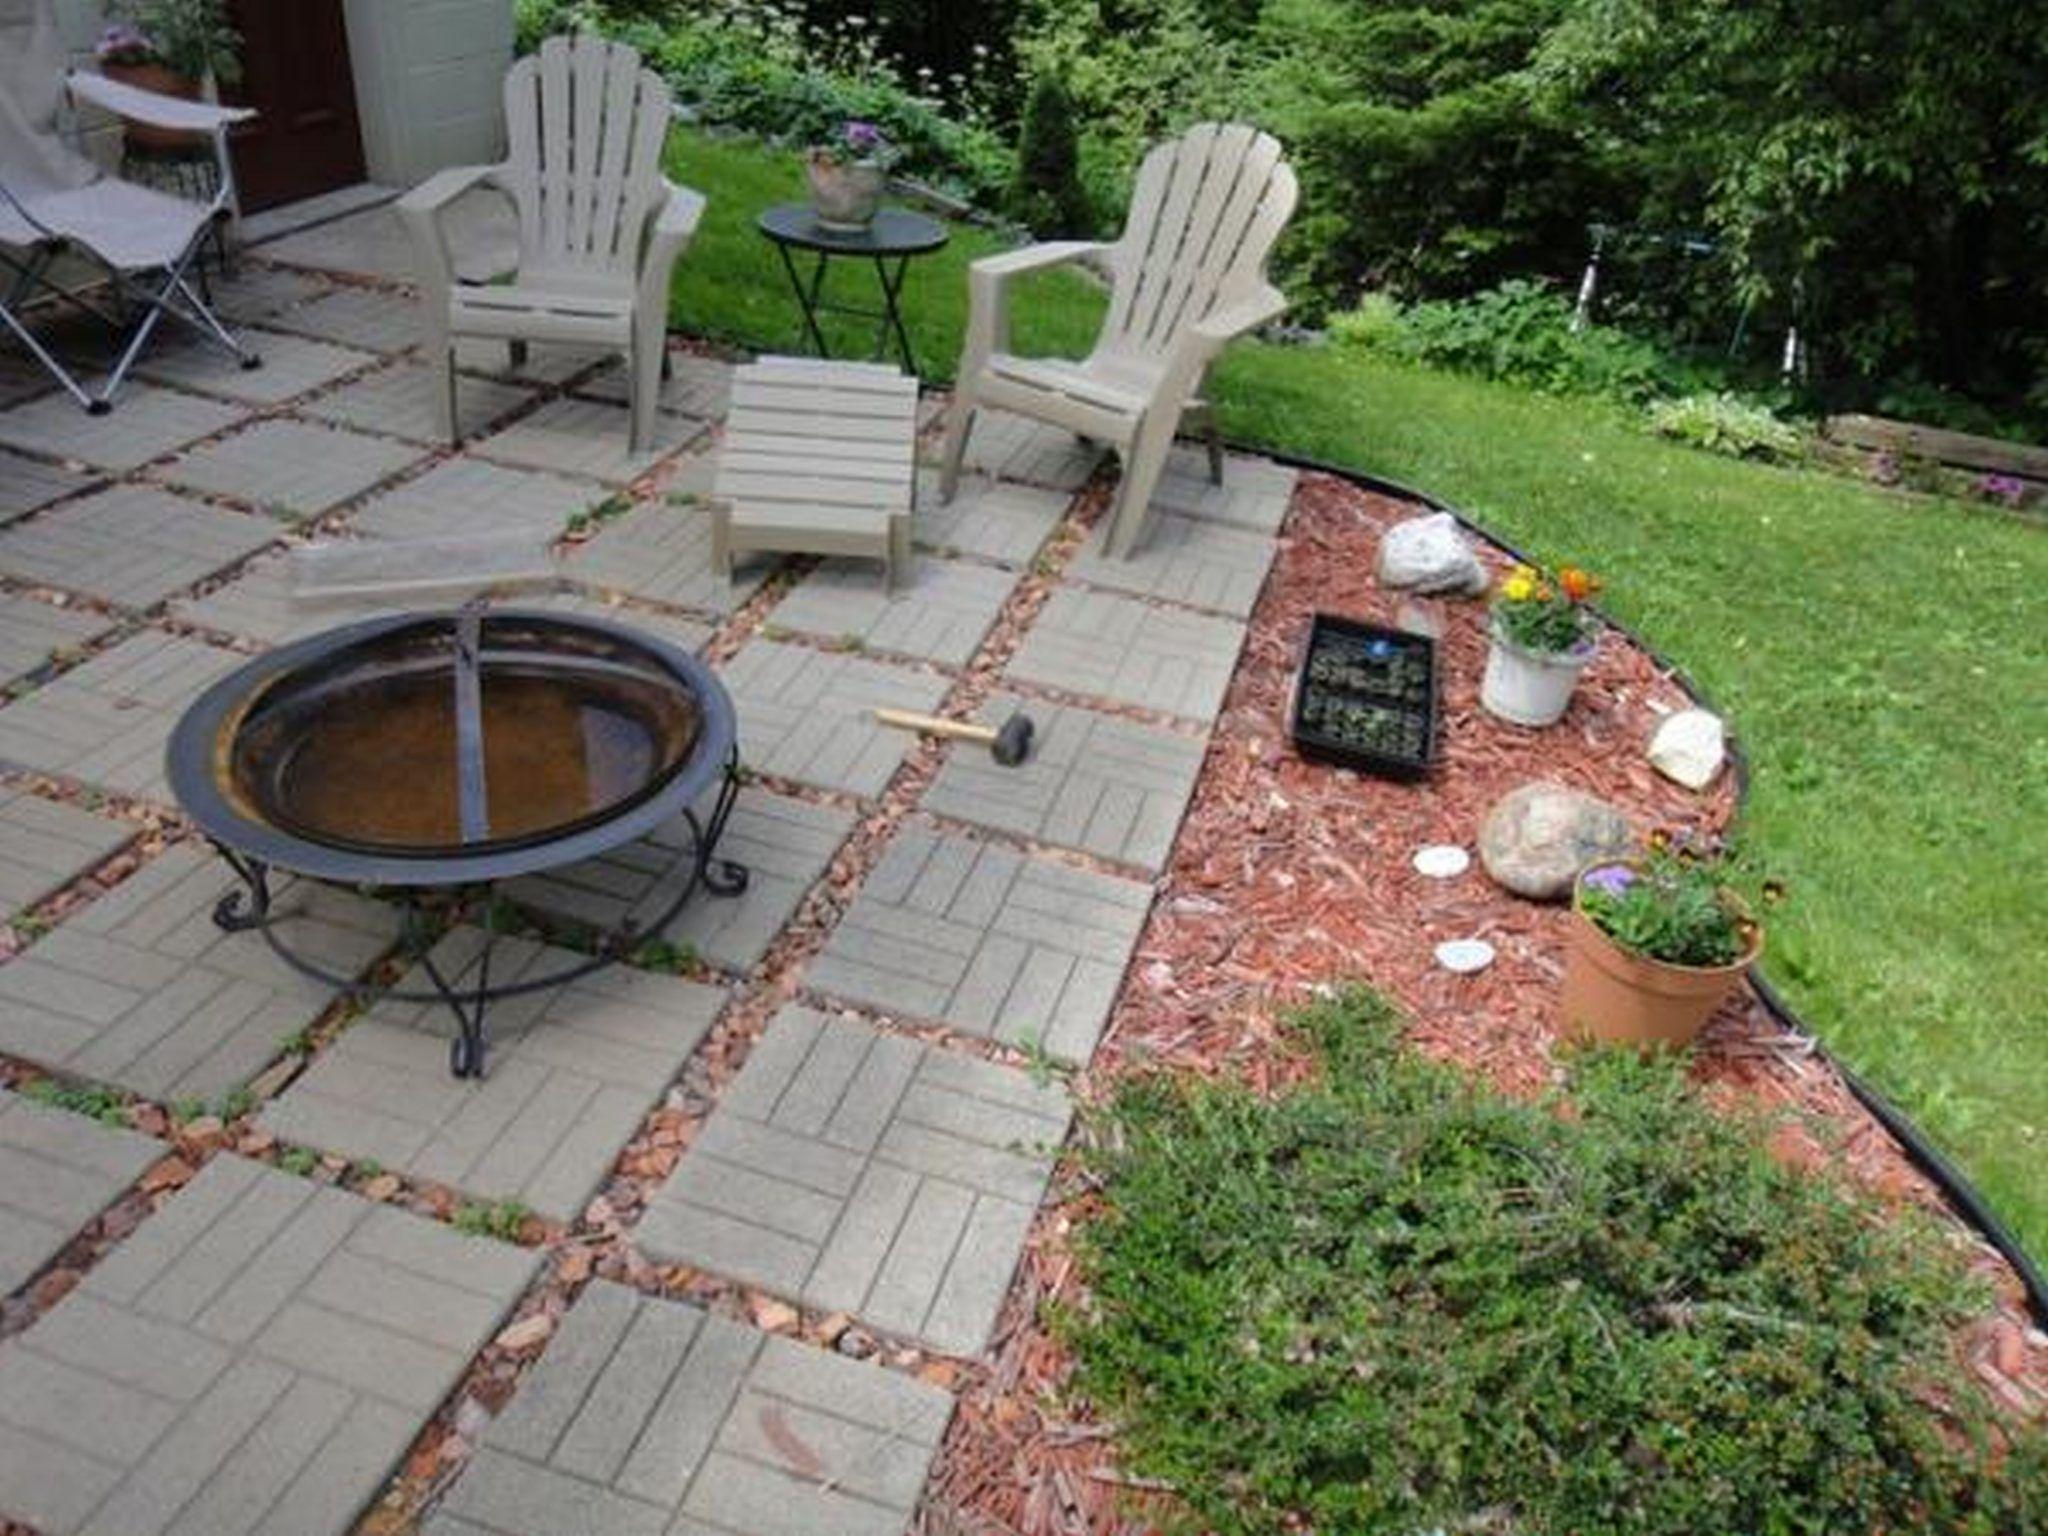 High Quality Backyard Cement Patio Ideas Decor Of Concrete Patio Ideas For Small  Backyards Concrete Patio Ideas For Small Backyards As Small Cheap Concrete  Patio Ideas ...